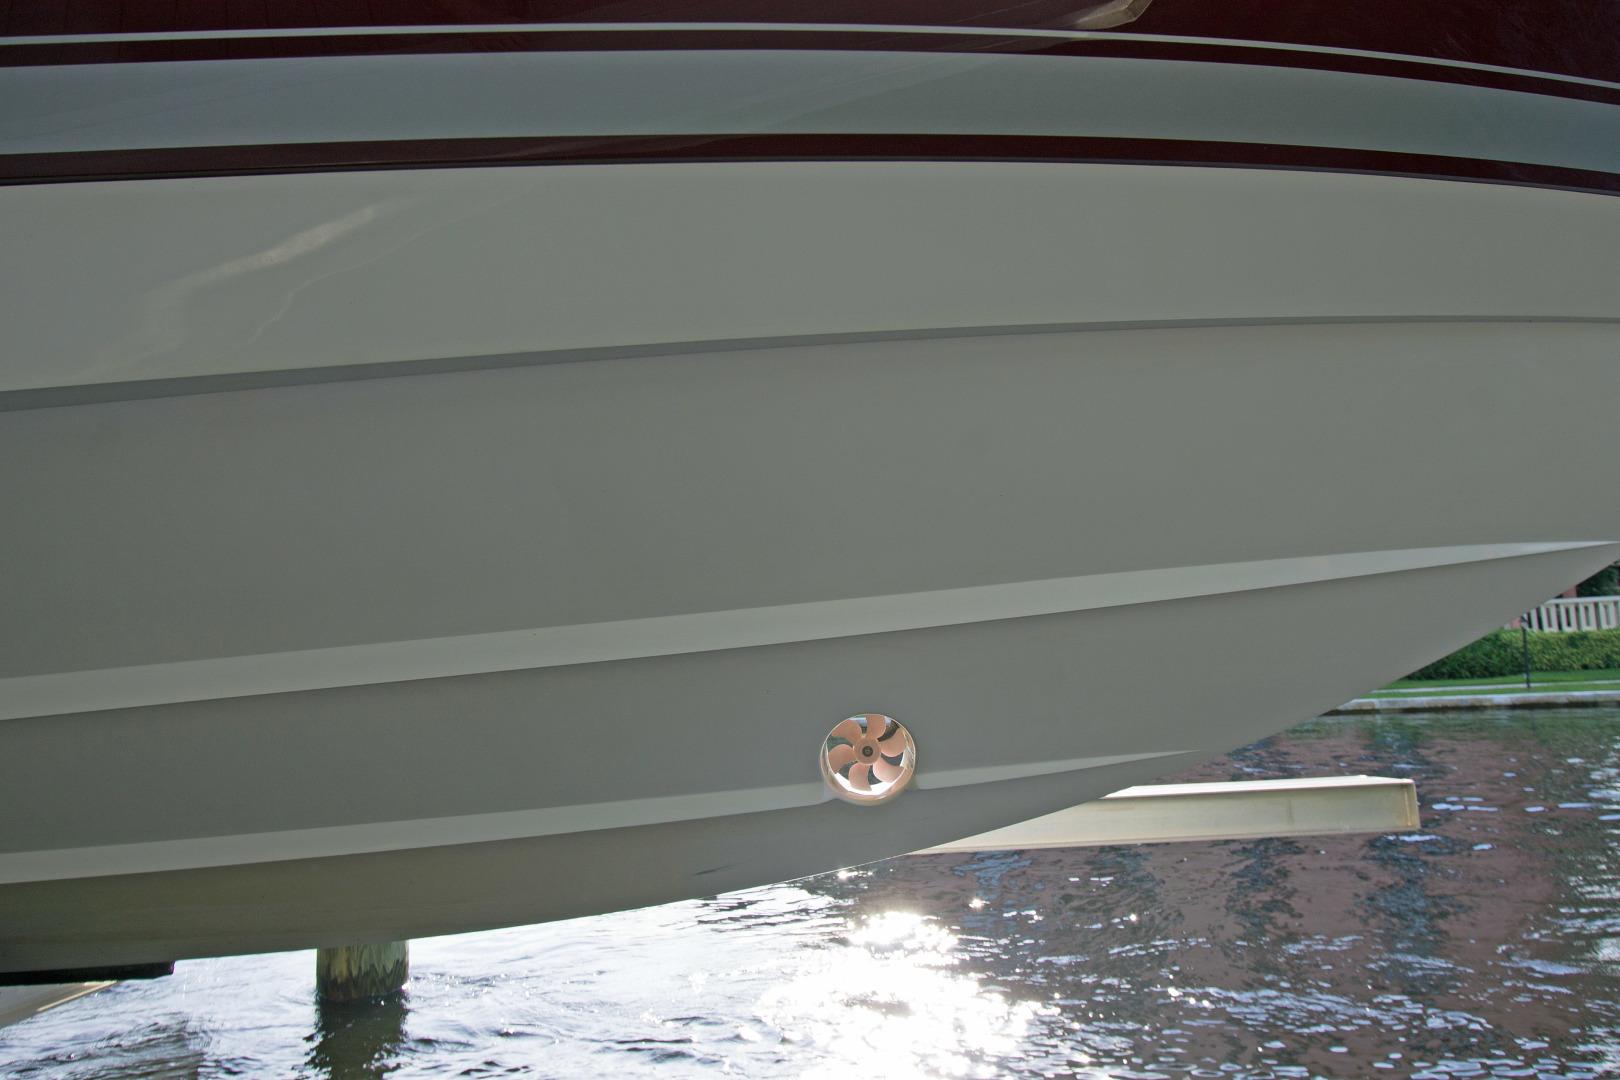 Intrepid-375 Walkaround 2014-NN 375 Walkaround 2014 Fort Lauderdale-Florida-United States-1507865 | Thumbnail